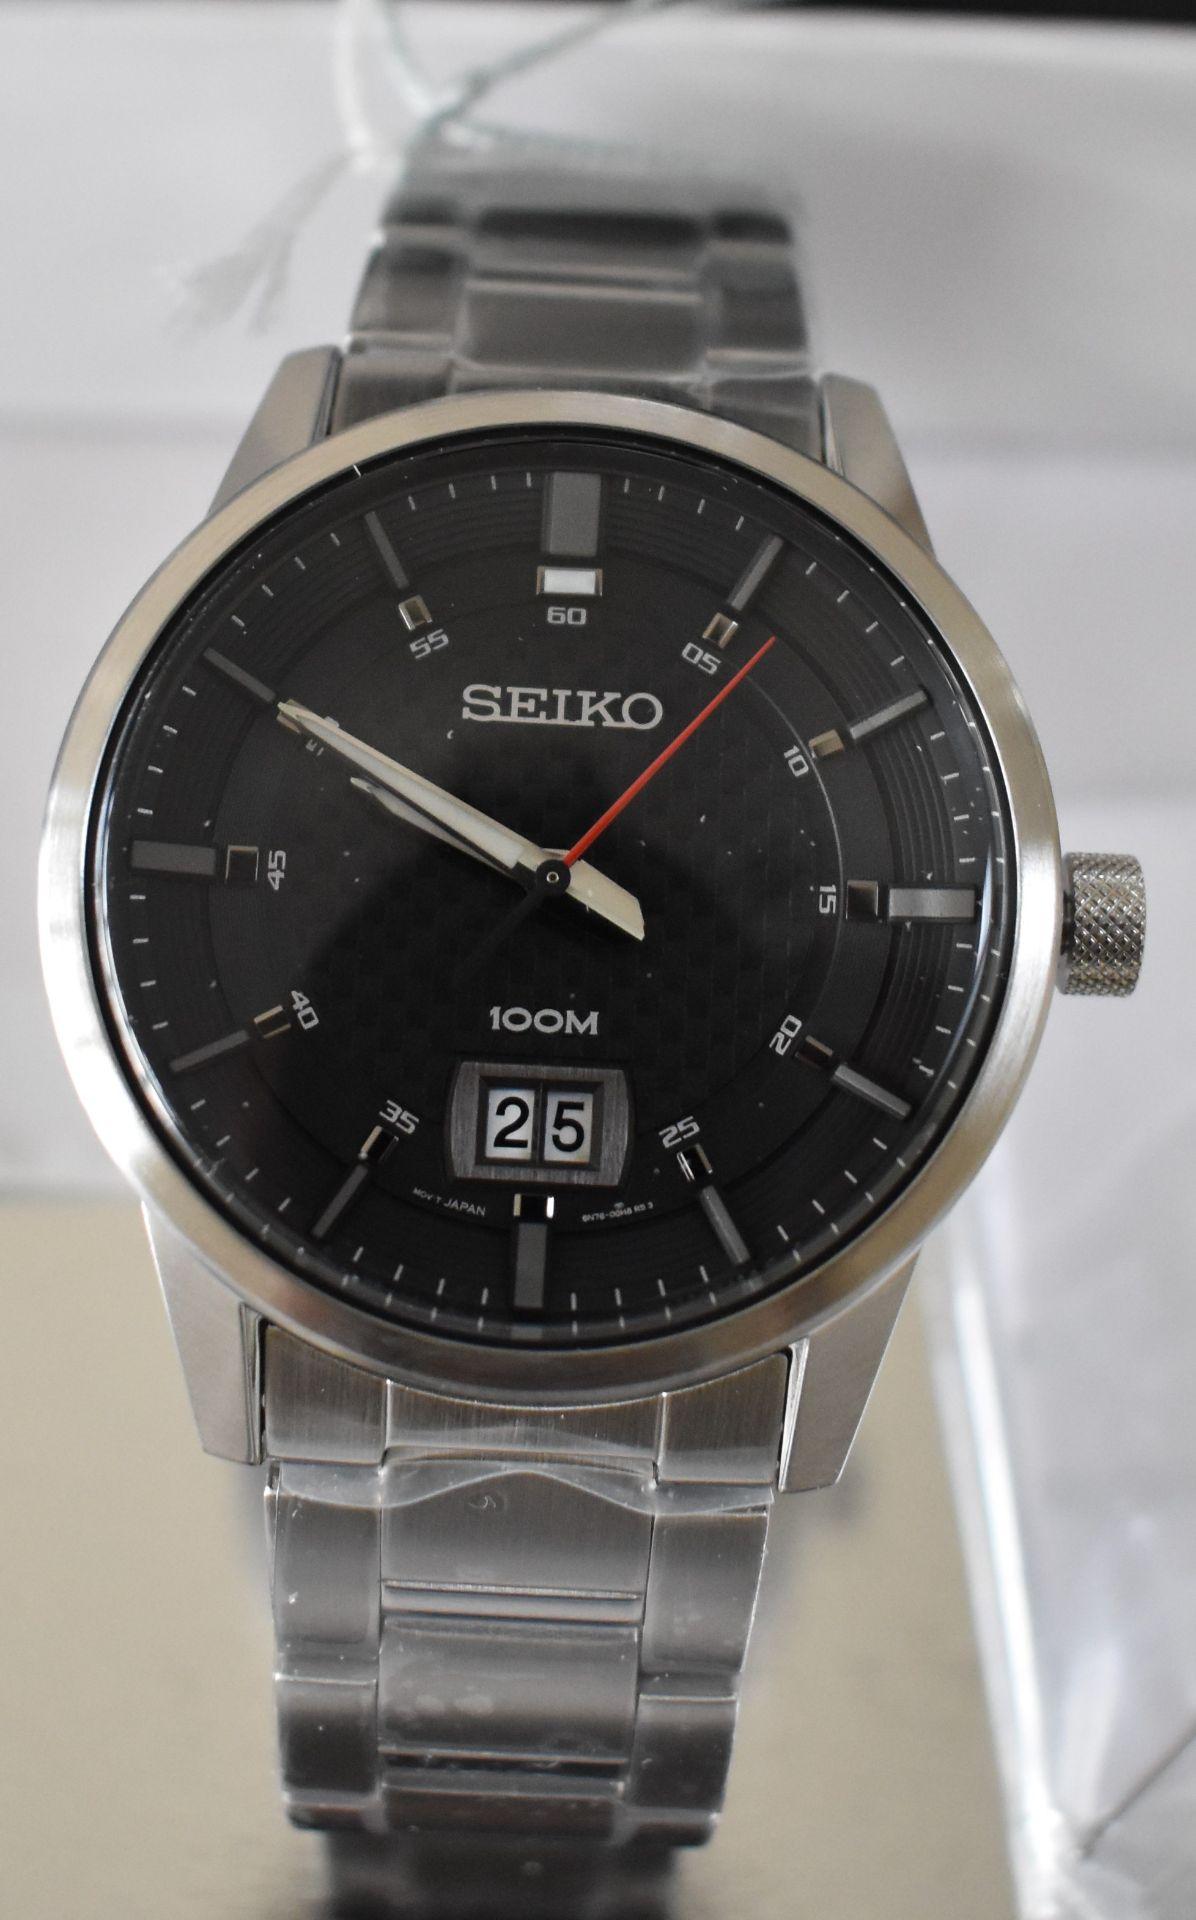 Seiko Men's Watch SUR269P1 - Image 2 of 2